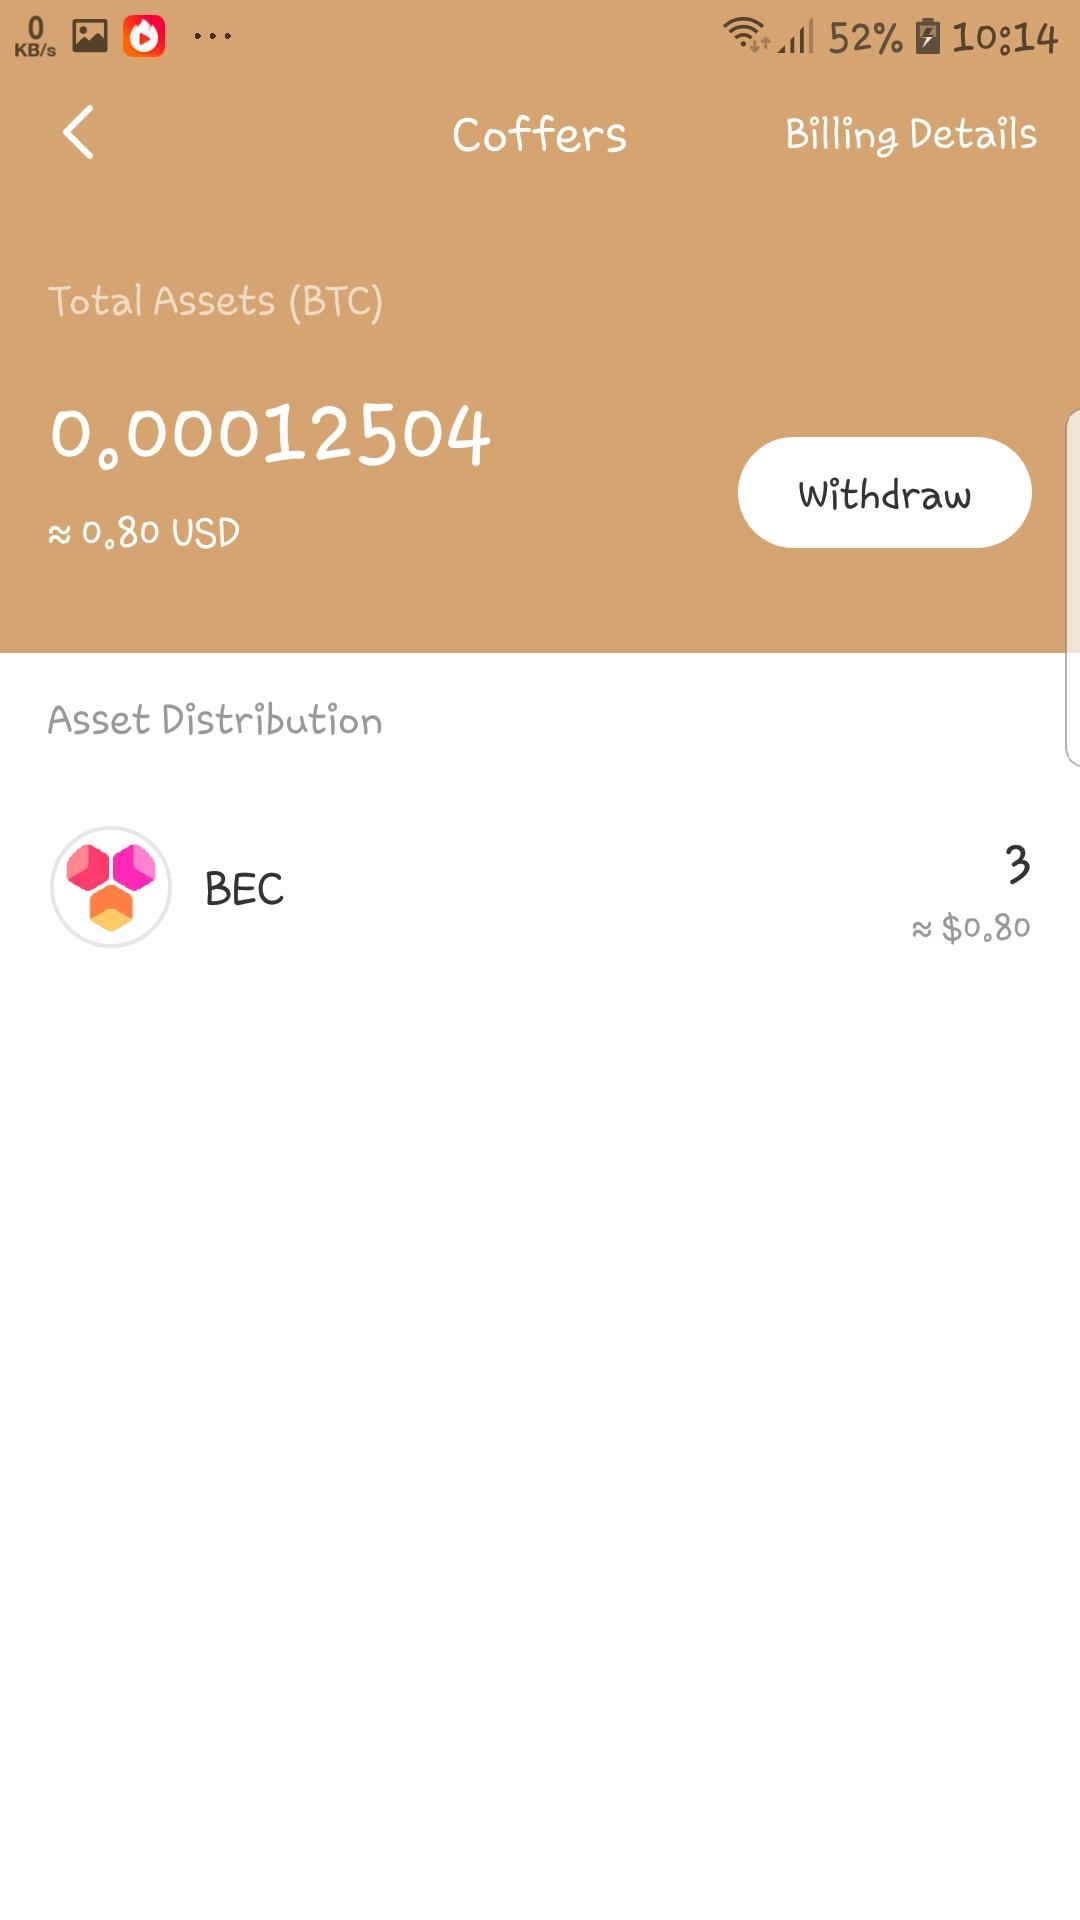 Deal - 30BMF SIGNUP OFFER & EARN FREE BEC CASH | BeerMoneyForum com